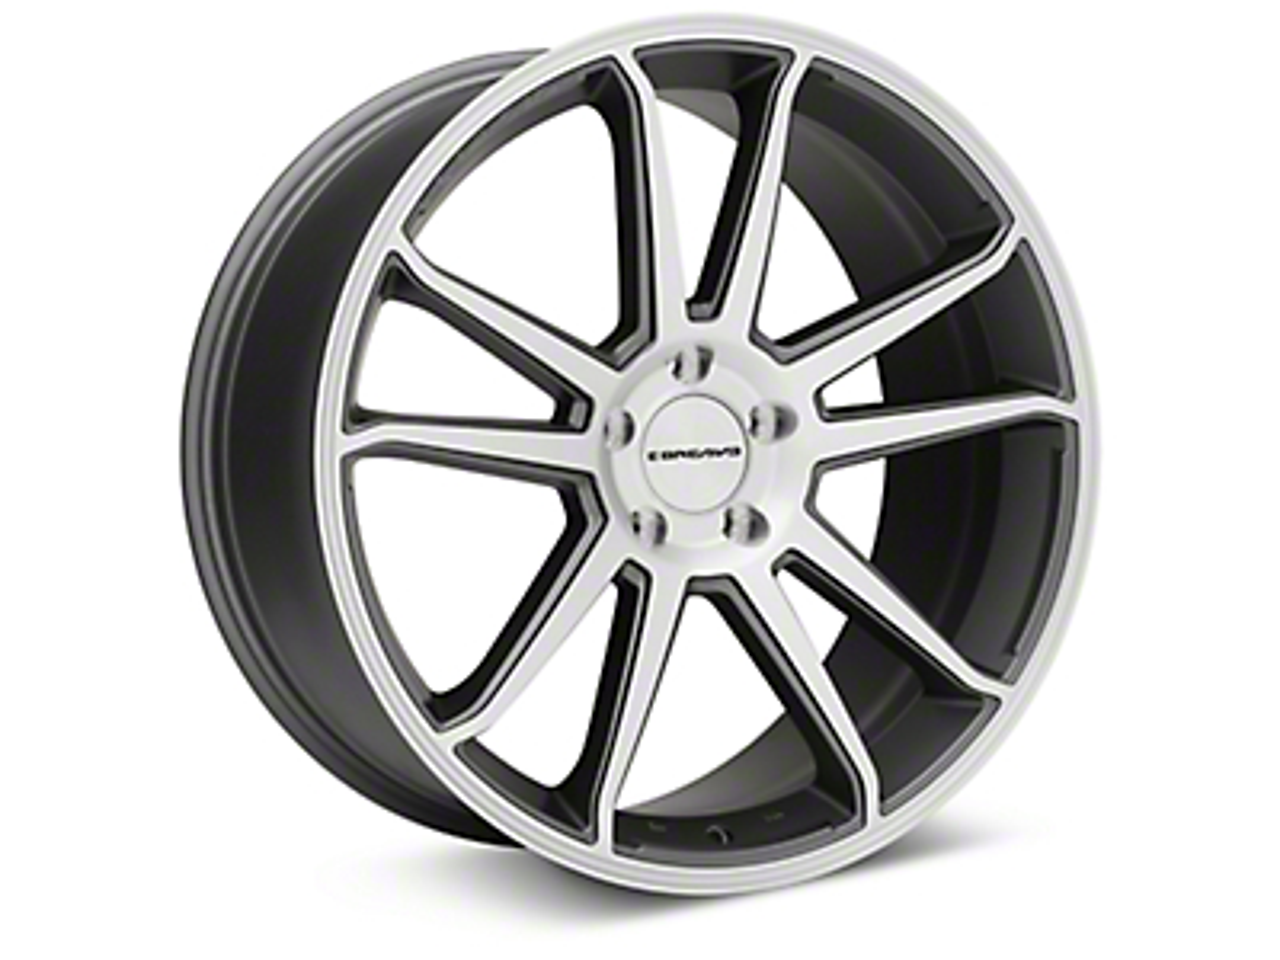 Concavo CW-S5 Matte Gray Machined Wheel - 20x9 (05-14 All)